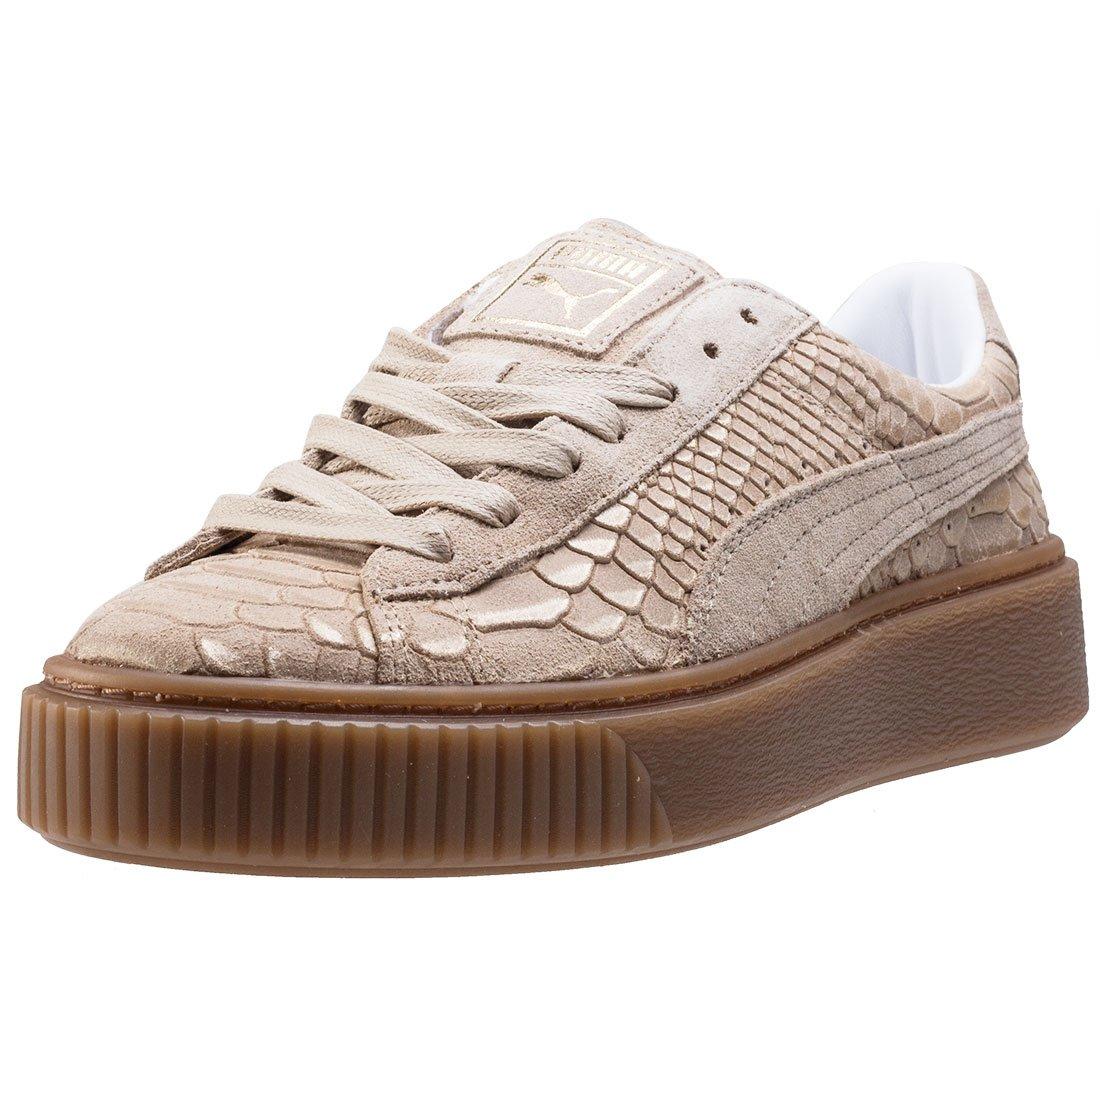 Puma Basket Platform Exotic Skin 36337702, Turnschuhe  37.5 EU|Sand